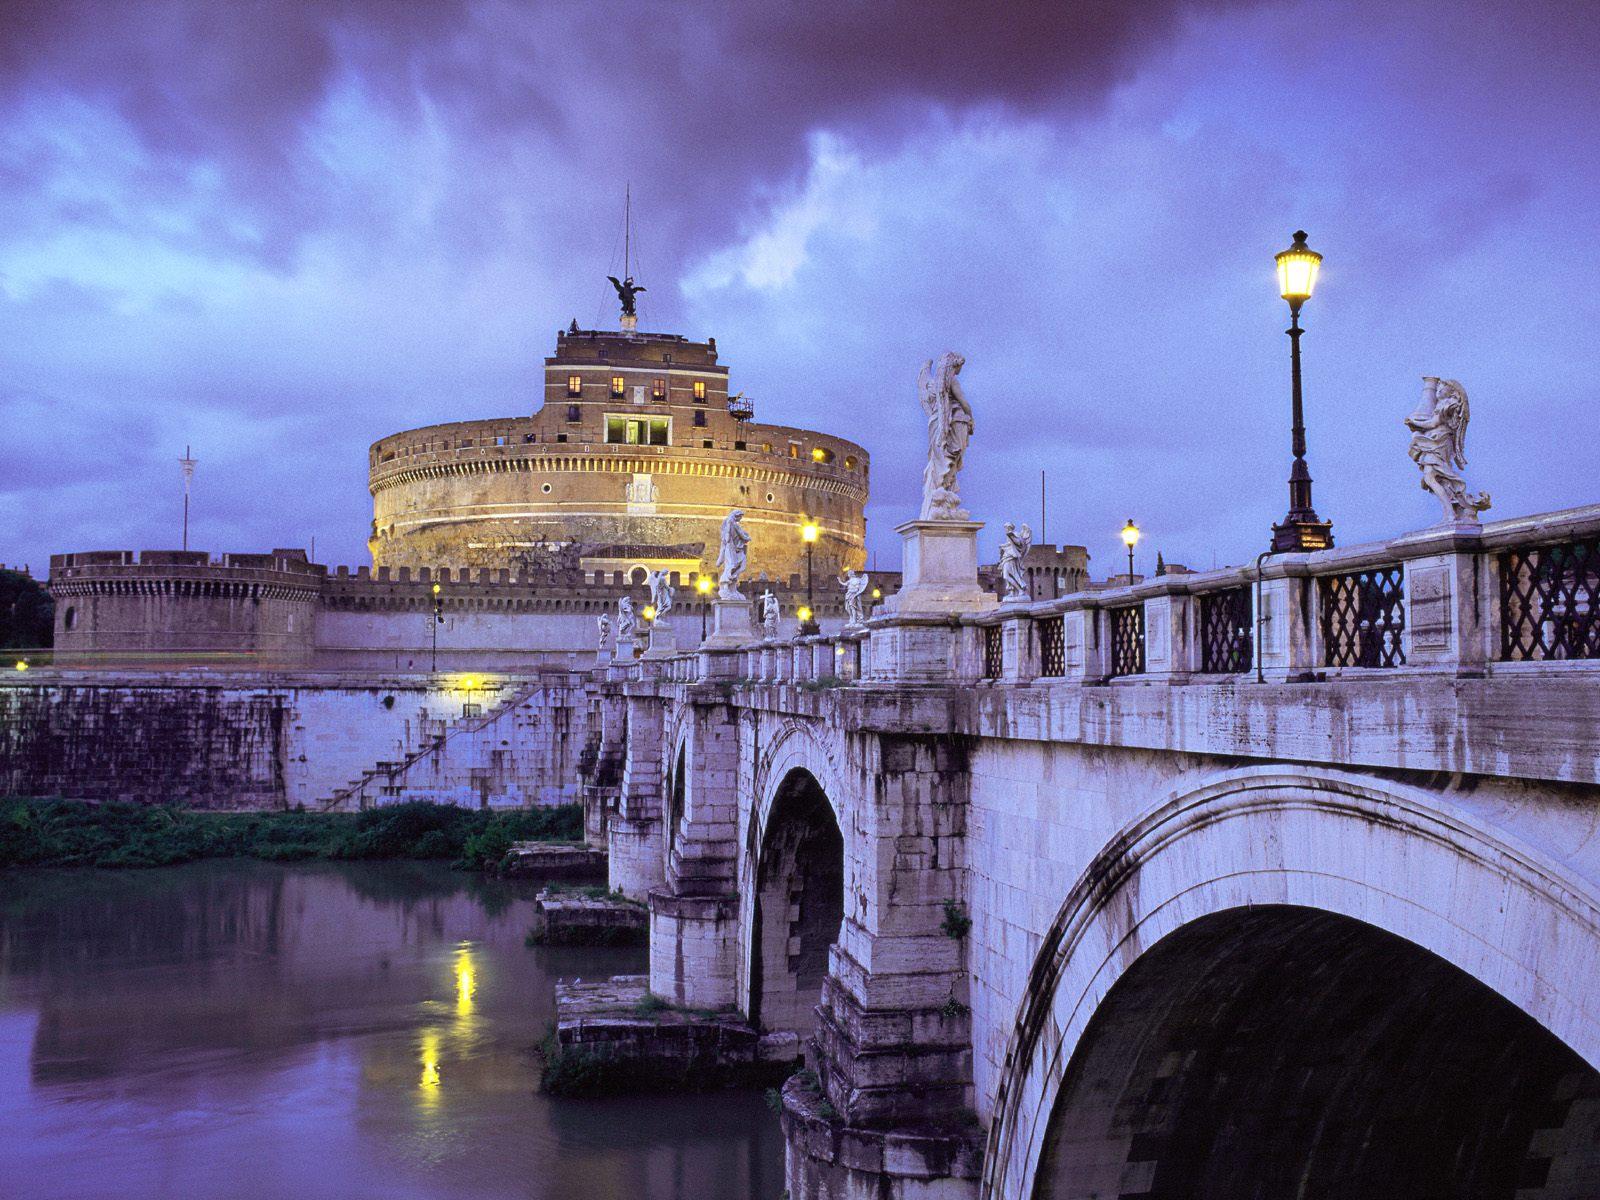 http://4.bp.blogspot.com/_Q2AG-fj5Wbc/TT0bAYsLVvI/AAAAAAAAAHQ/W1zjPKPdHdA/s1600/Castel_SantAngelo_and_Bridge_Rome_Italy.jpg